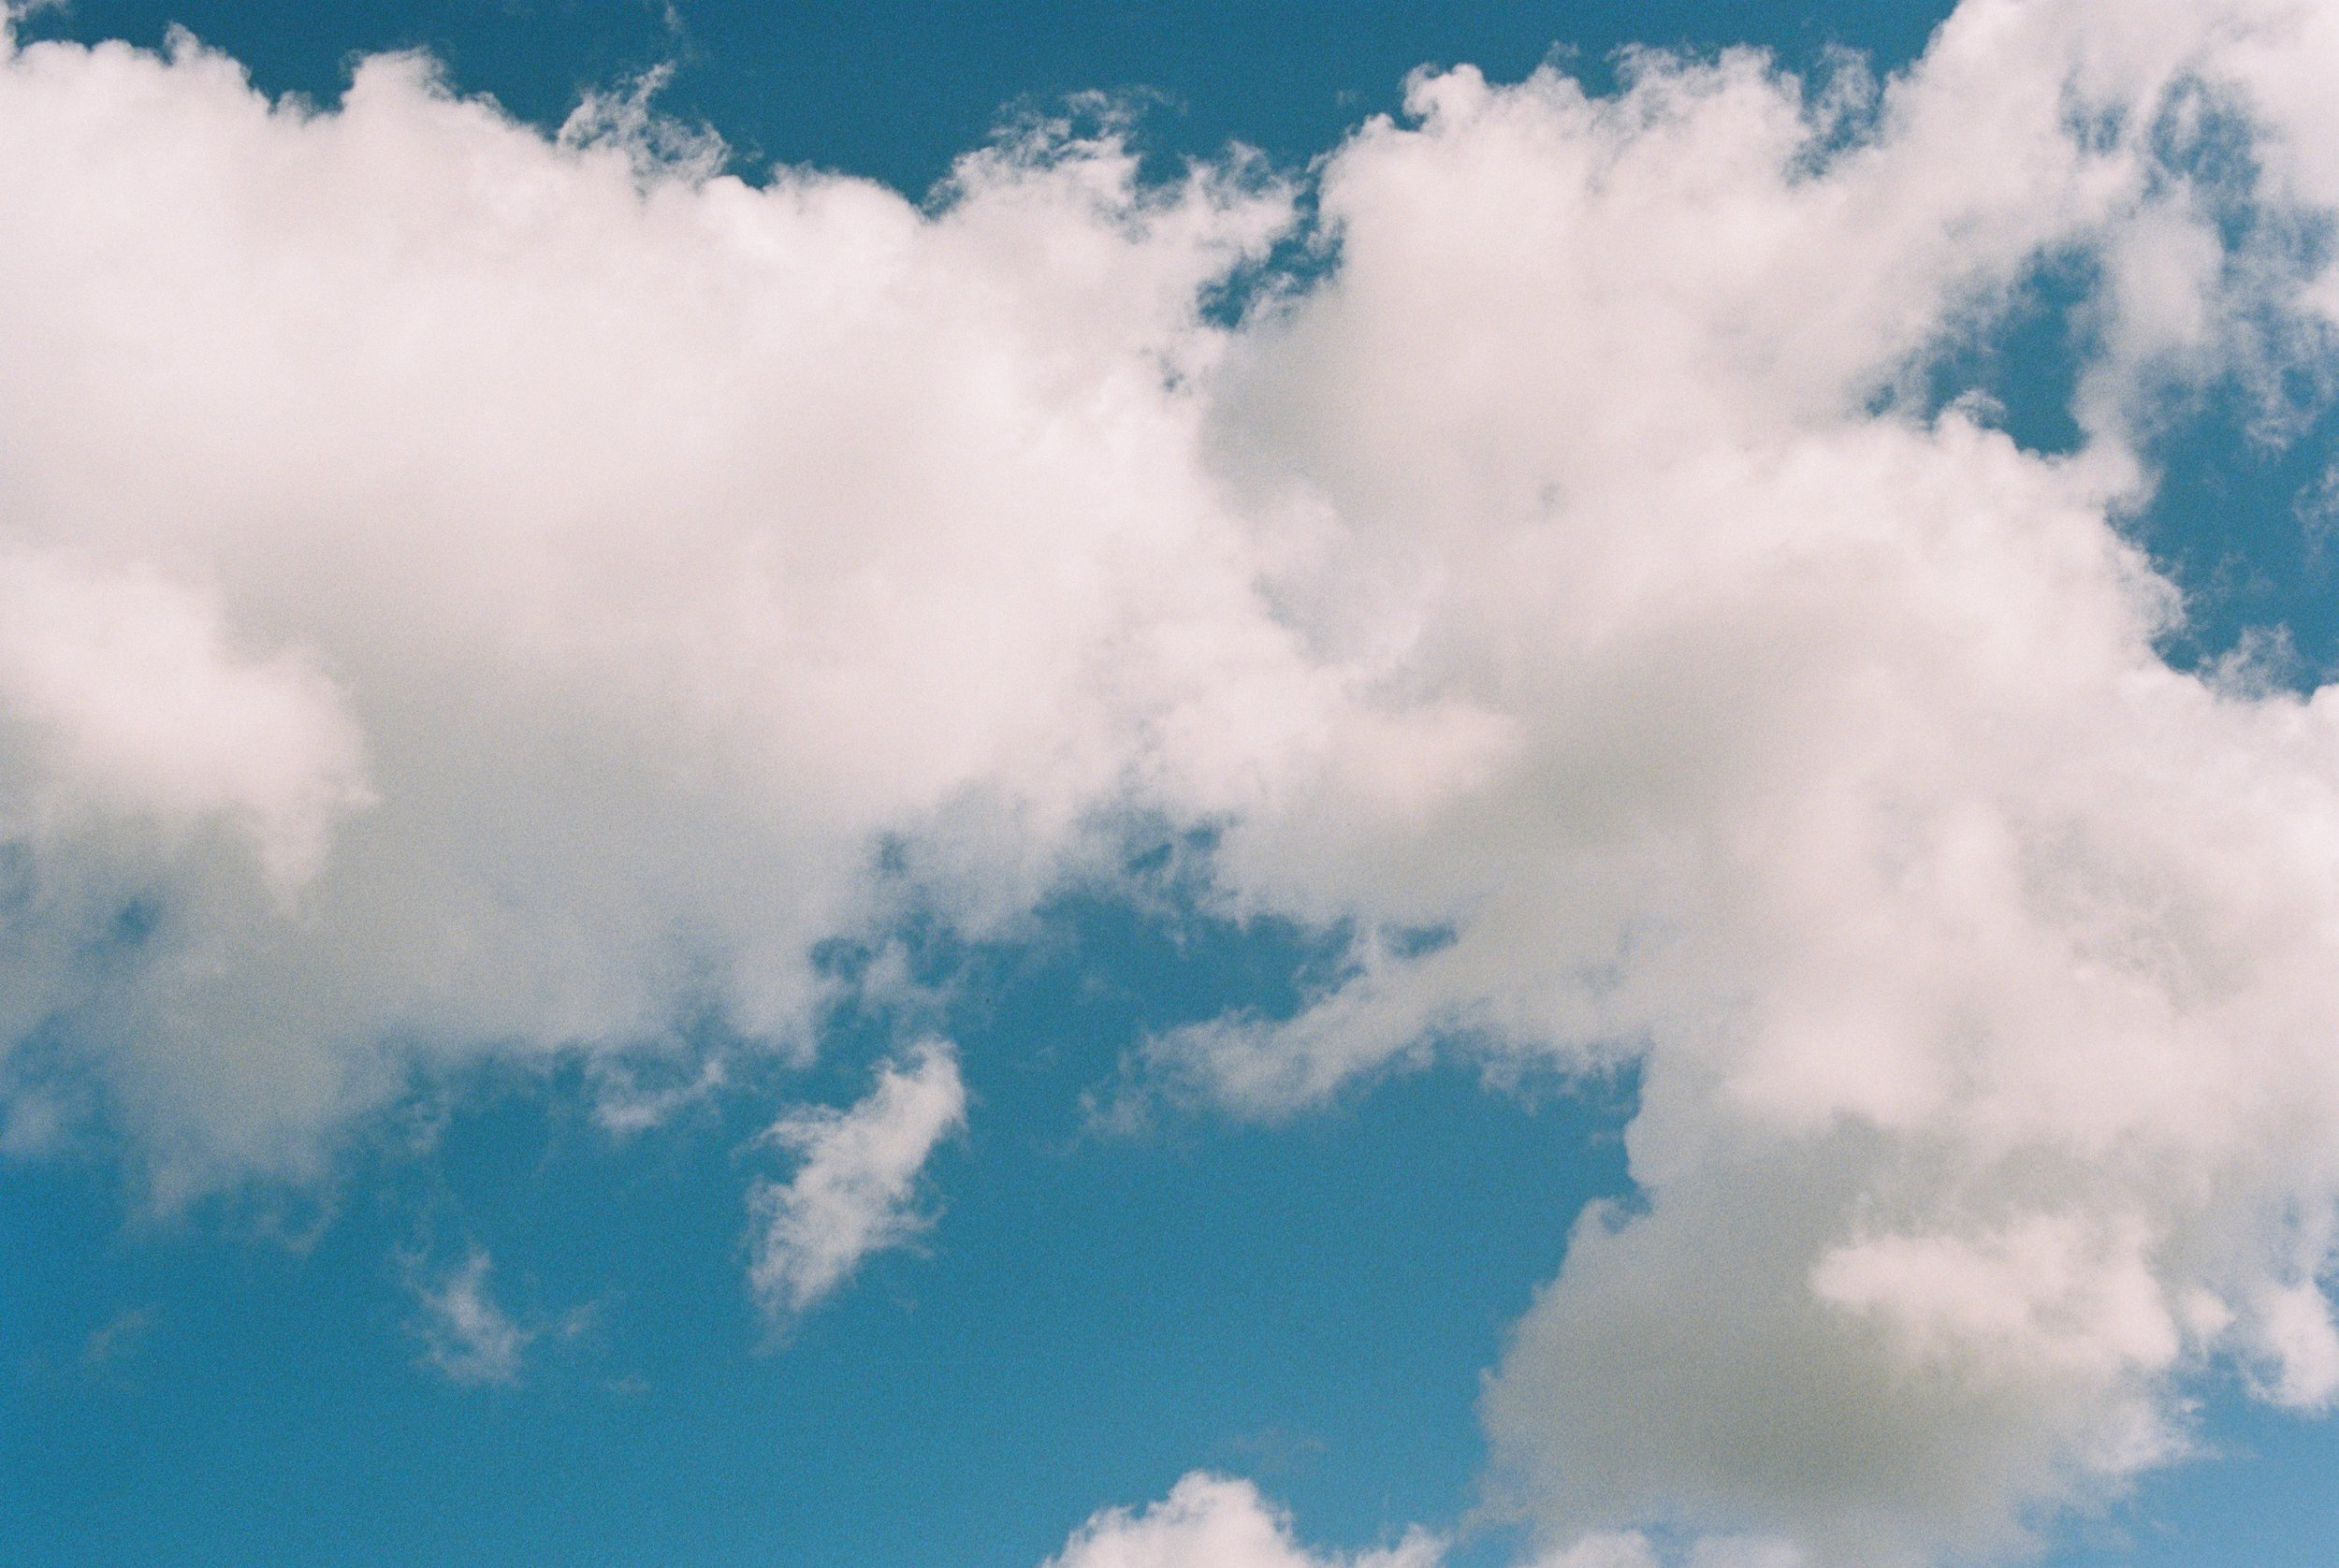 clouds_cloud_film_photographer_emily_walker_14.jpg